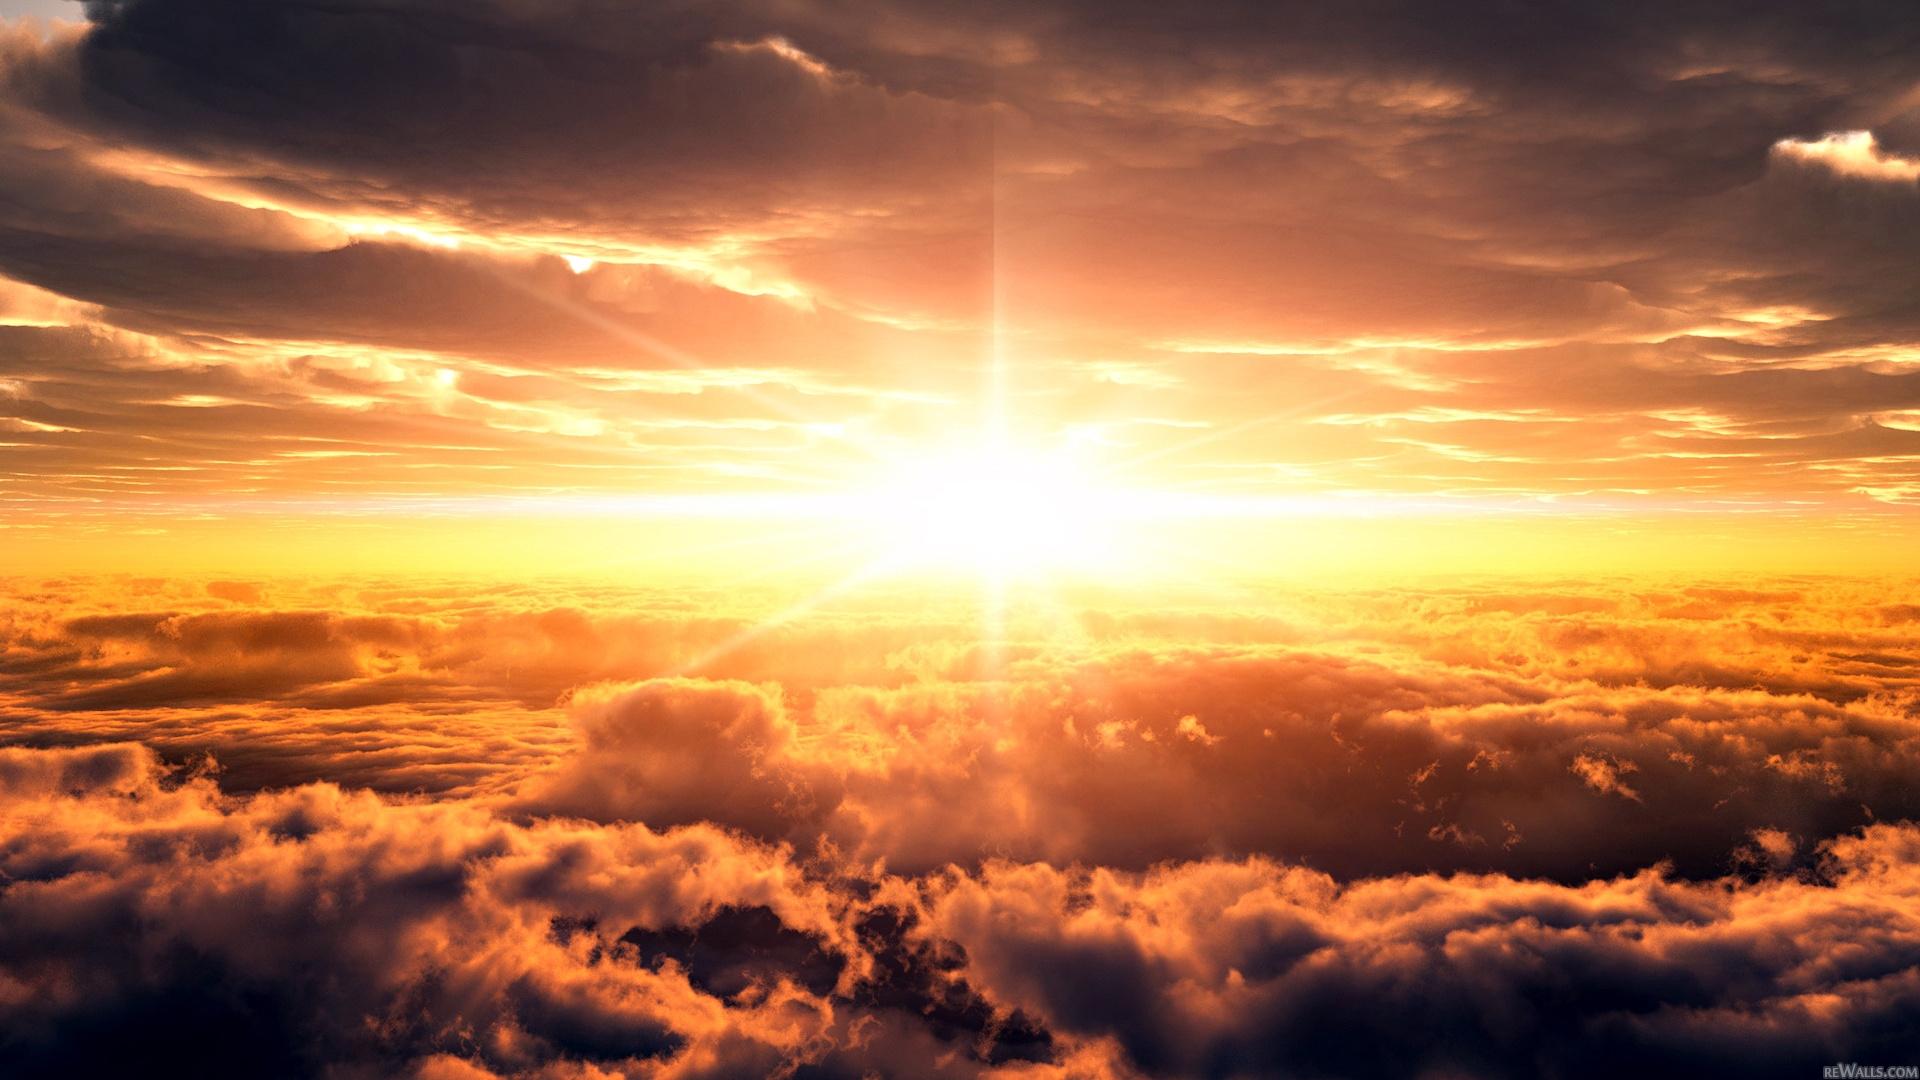 Great Shine Of The Earth - Great Shine Of The Earth